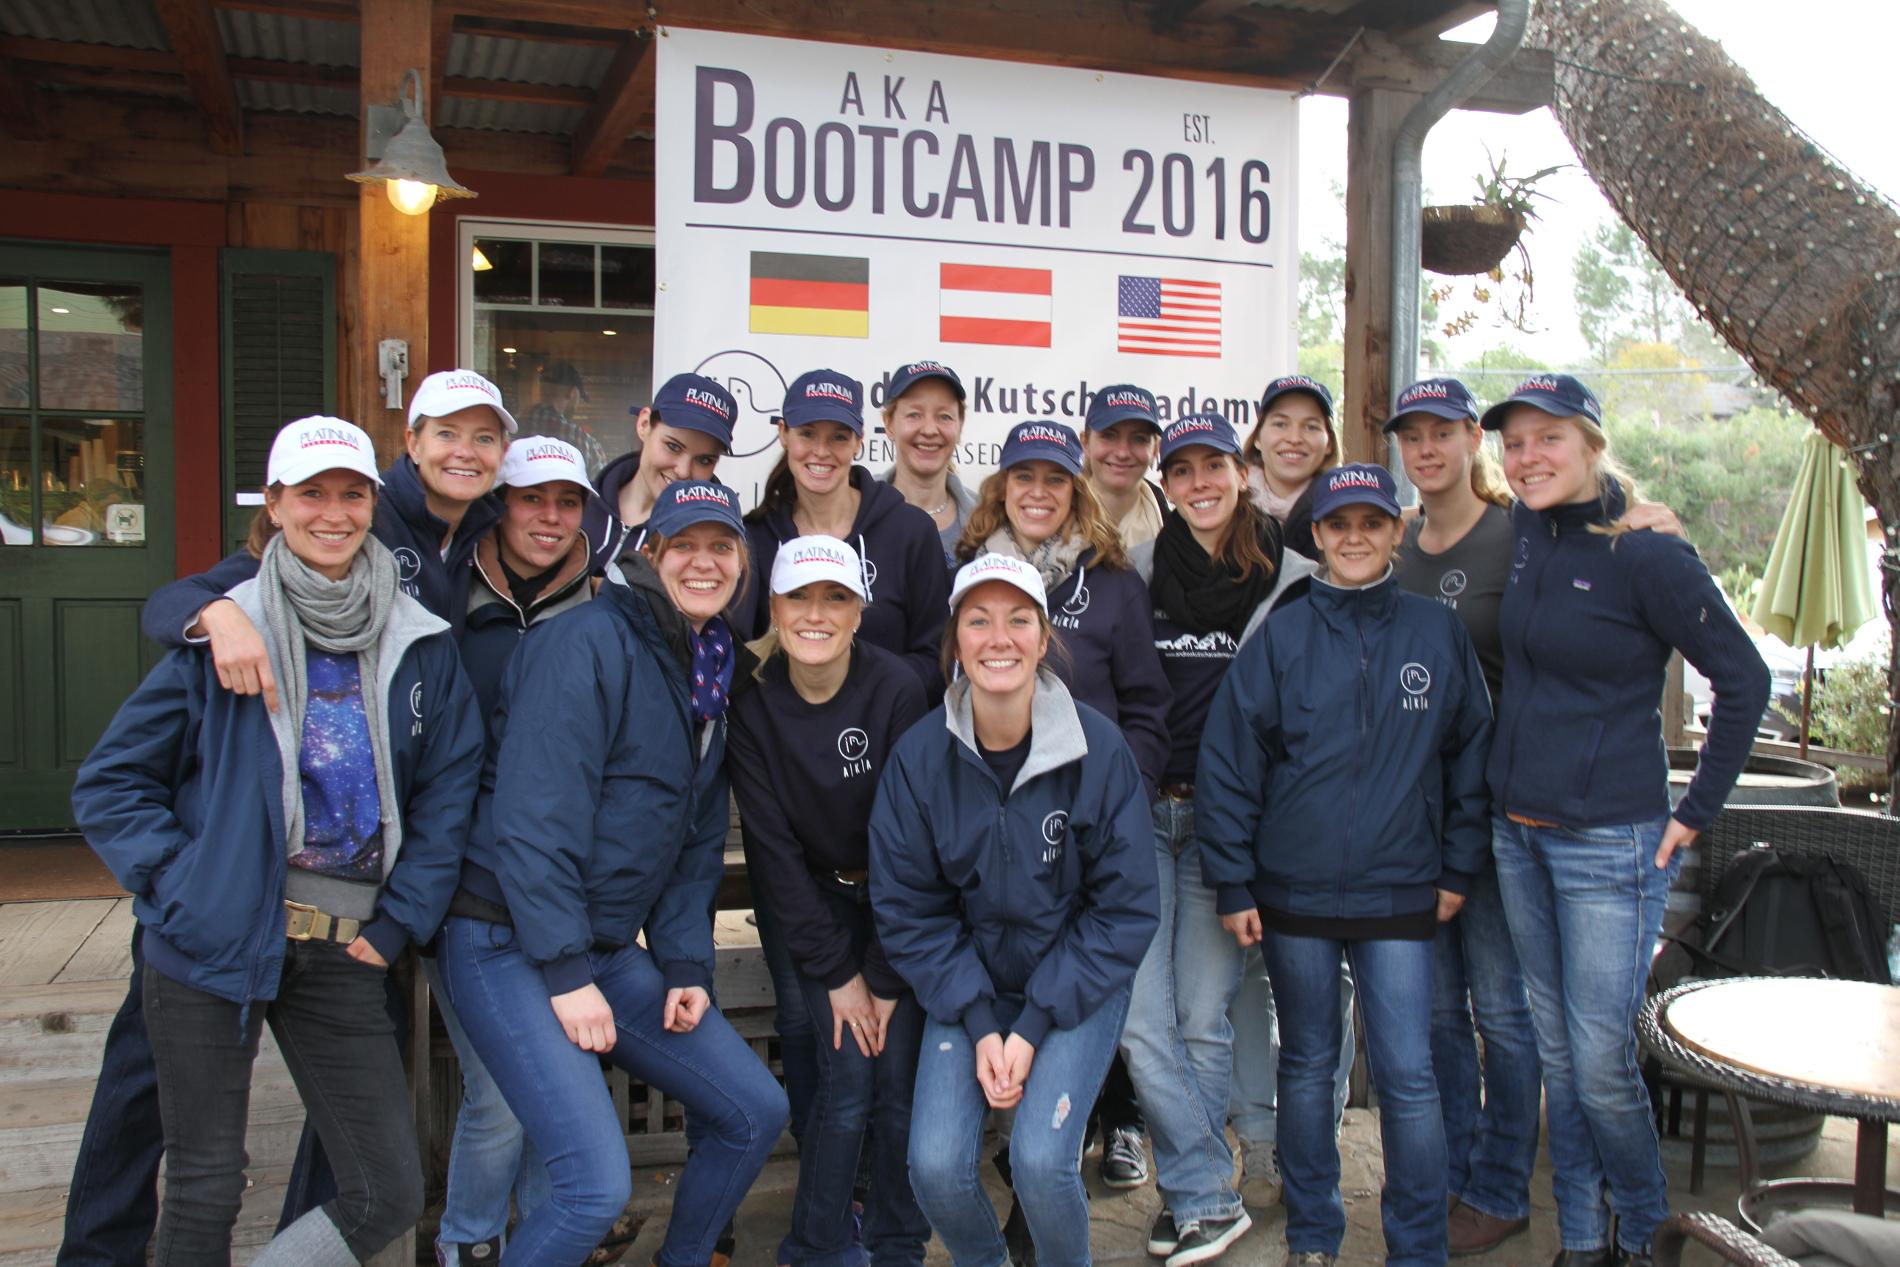 Bootcamp 2016